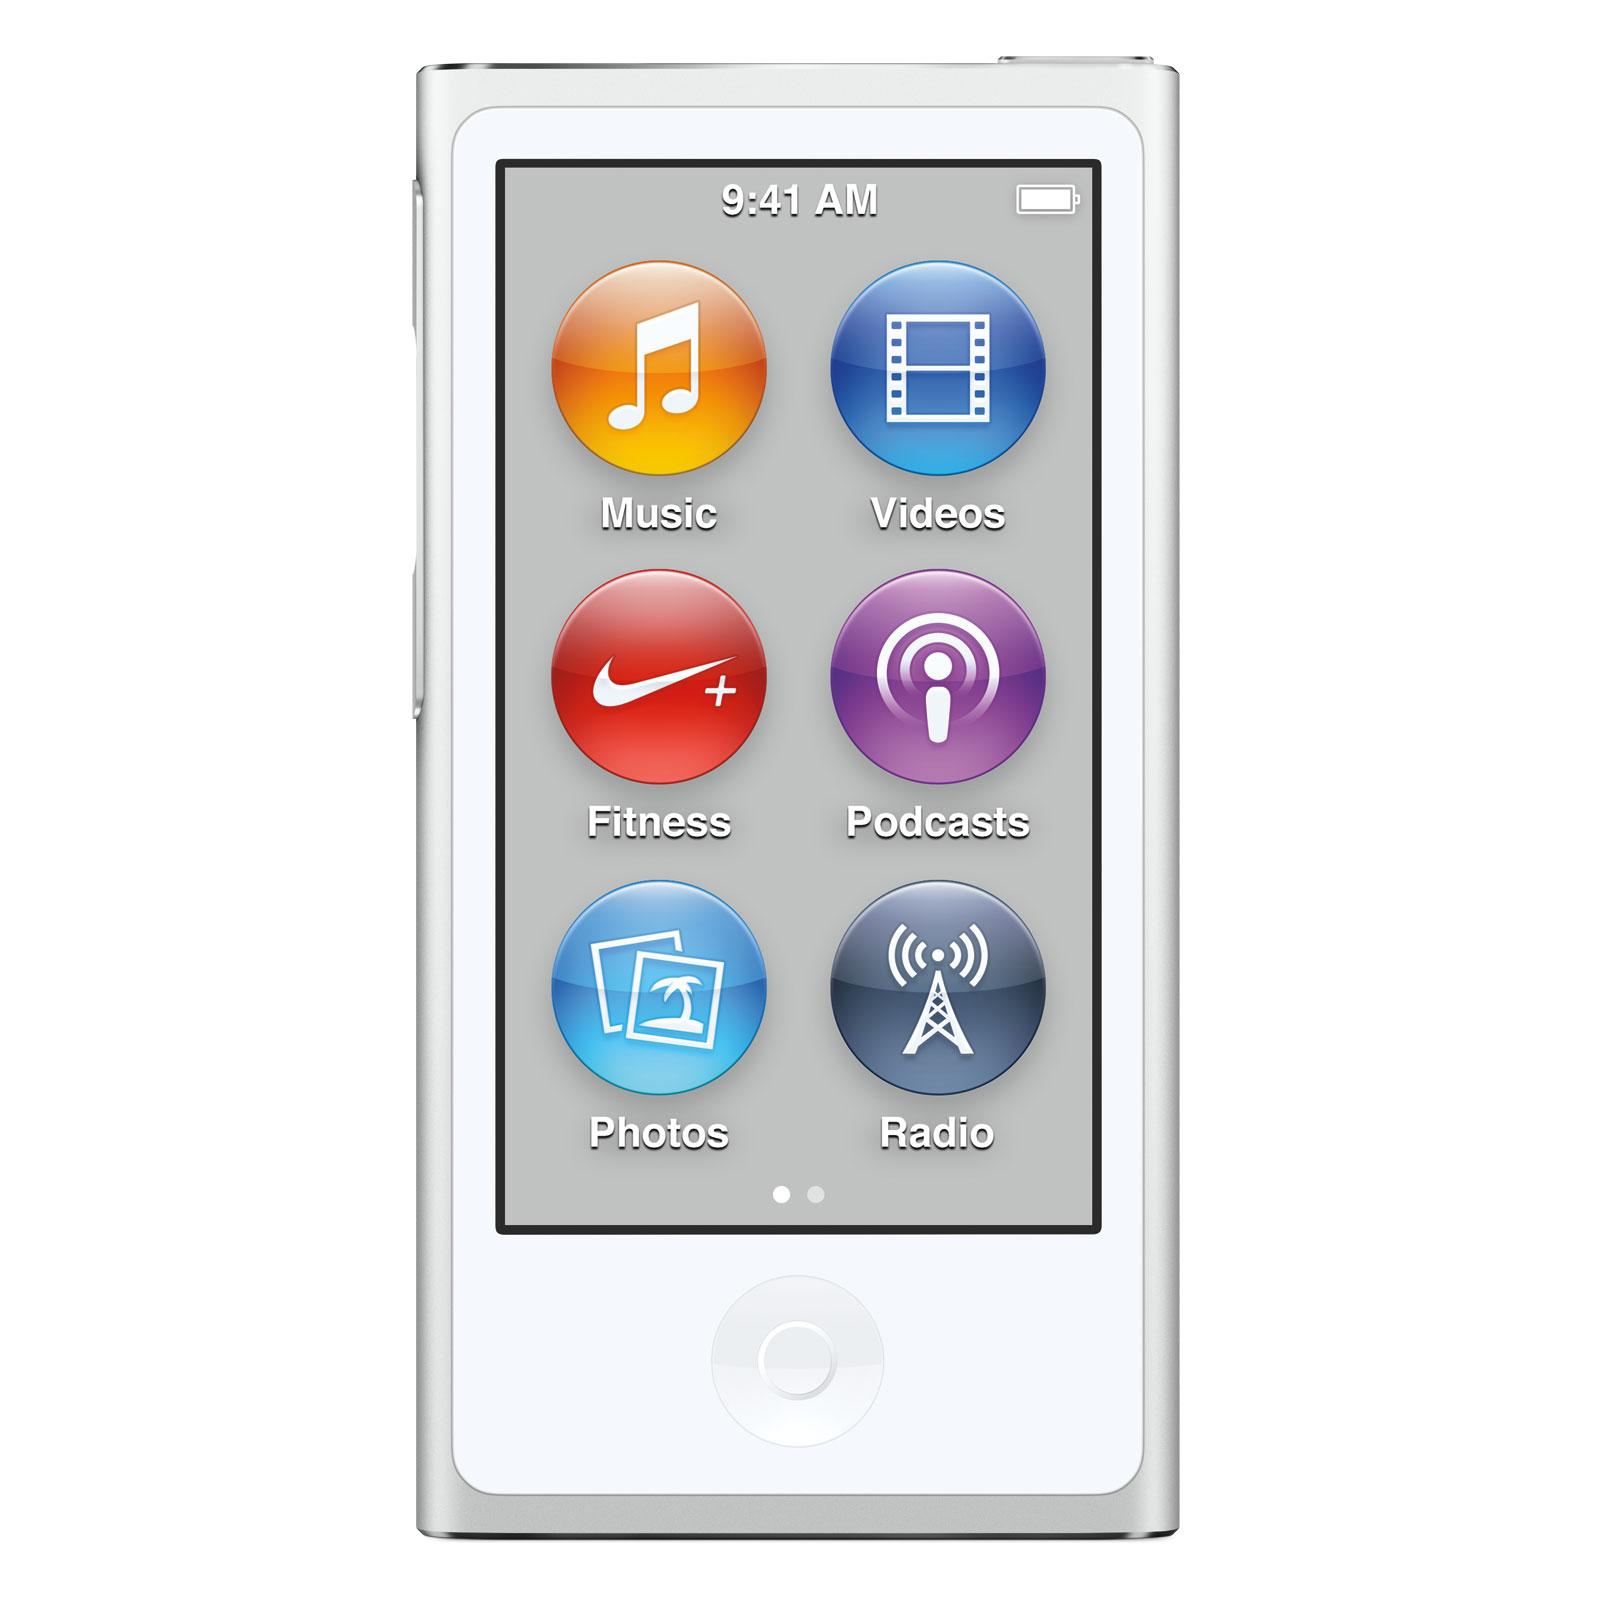 apple ipod nano 16 go argent 2015 lecteur mp3 ipod apple sur. Black Bedroom Furniture Sets. Home Design Ideas